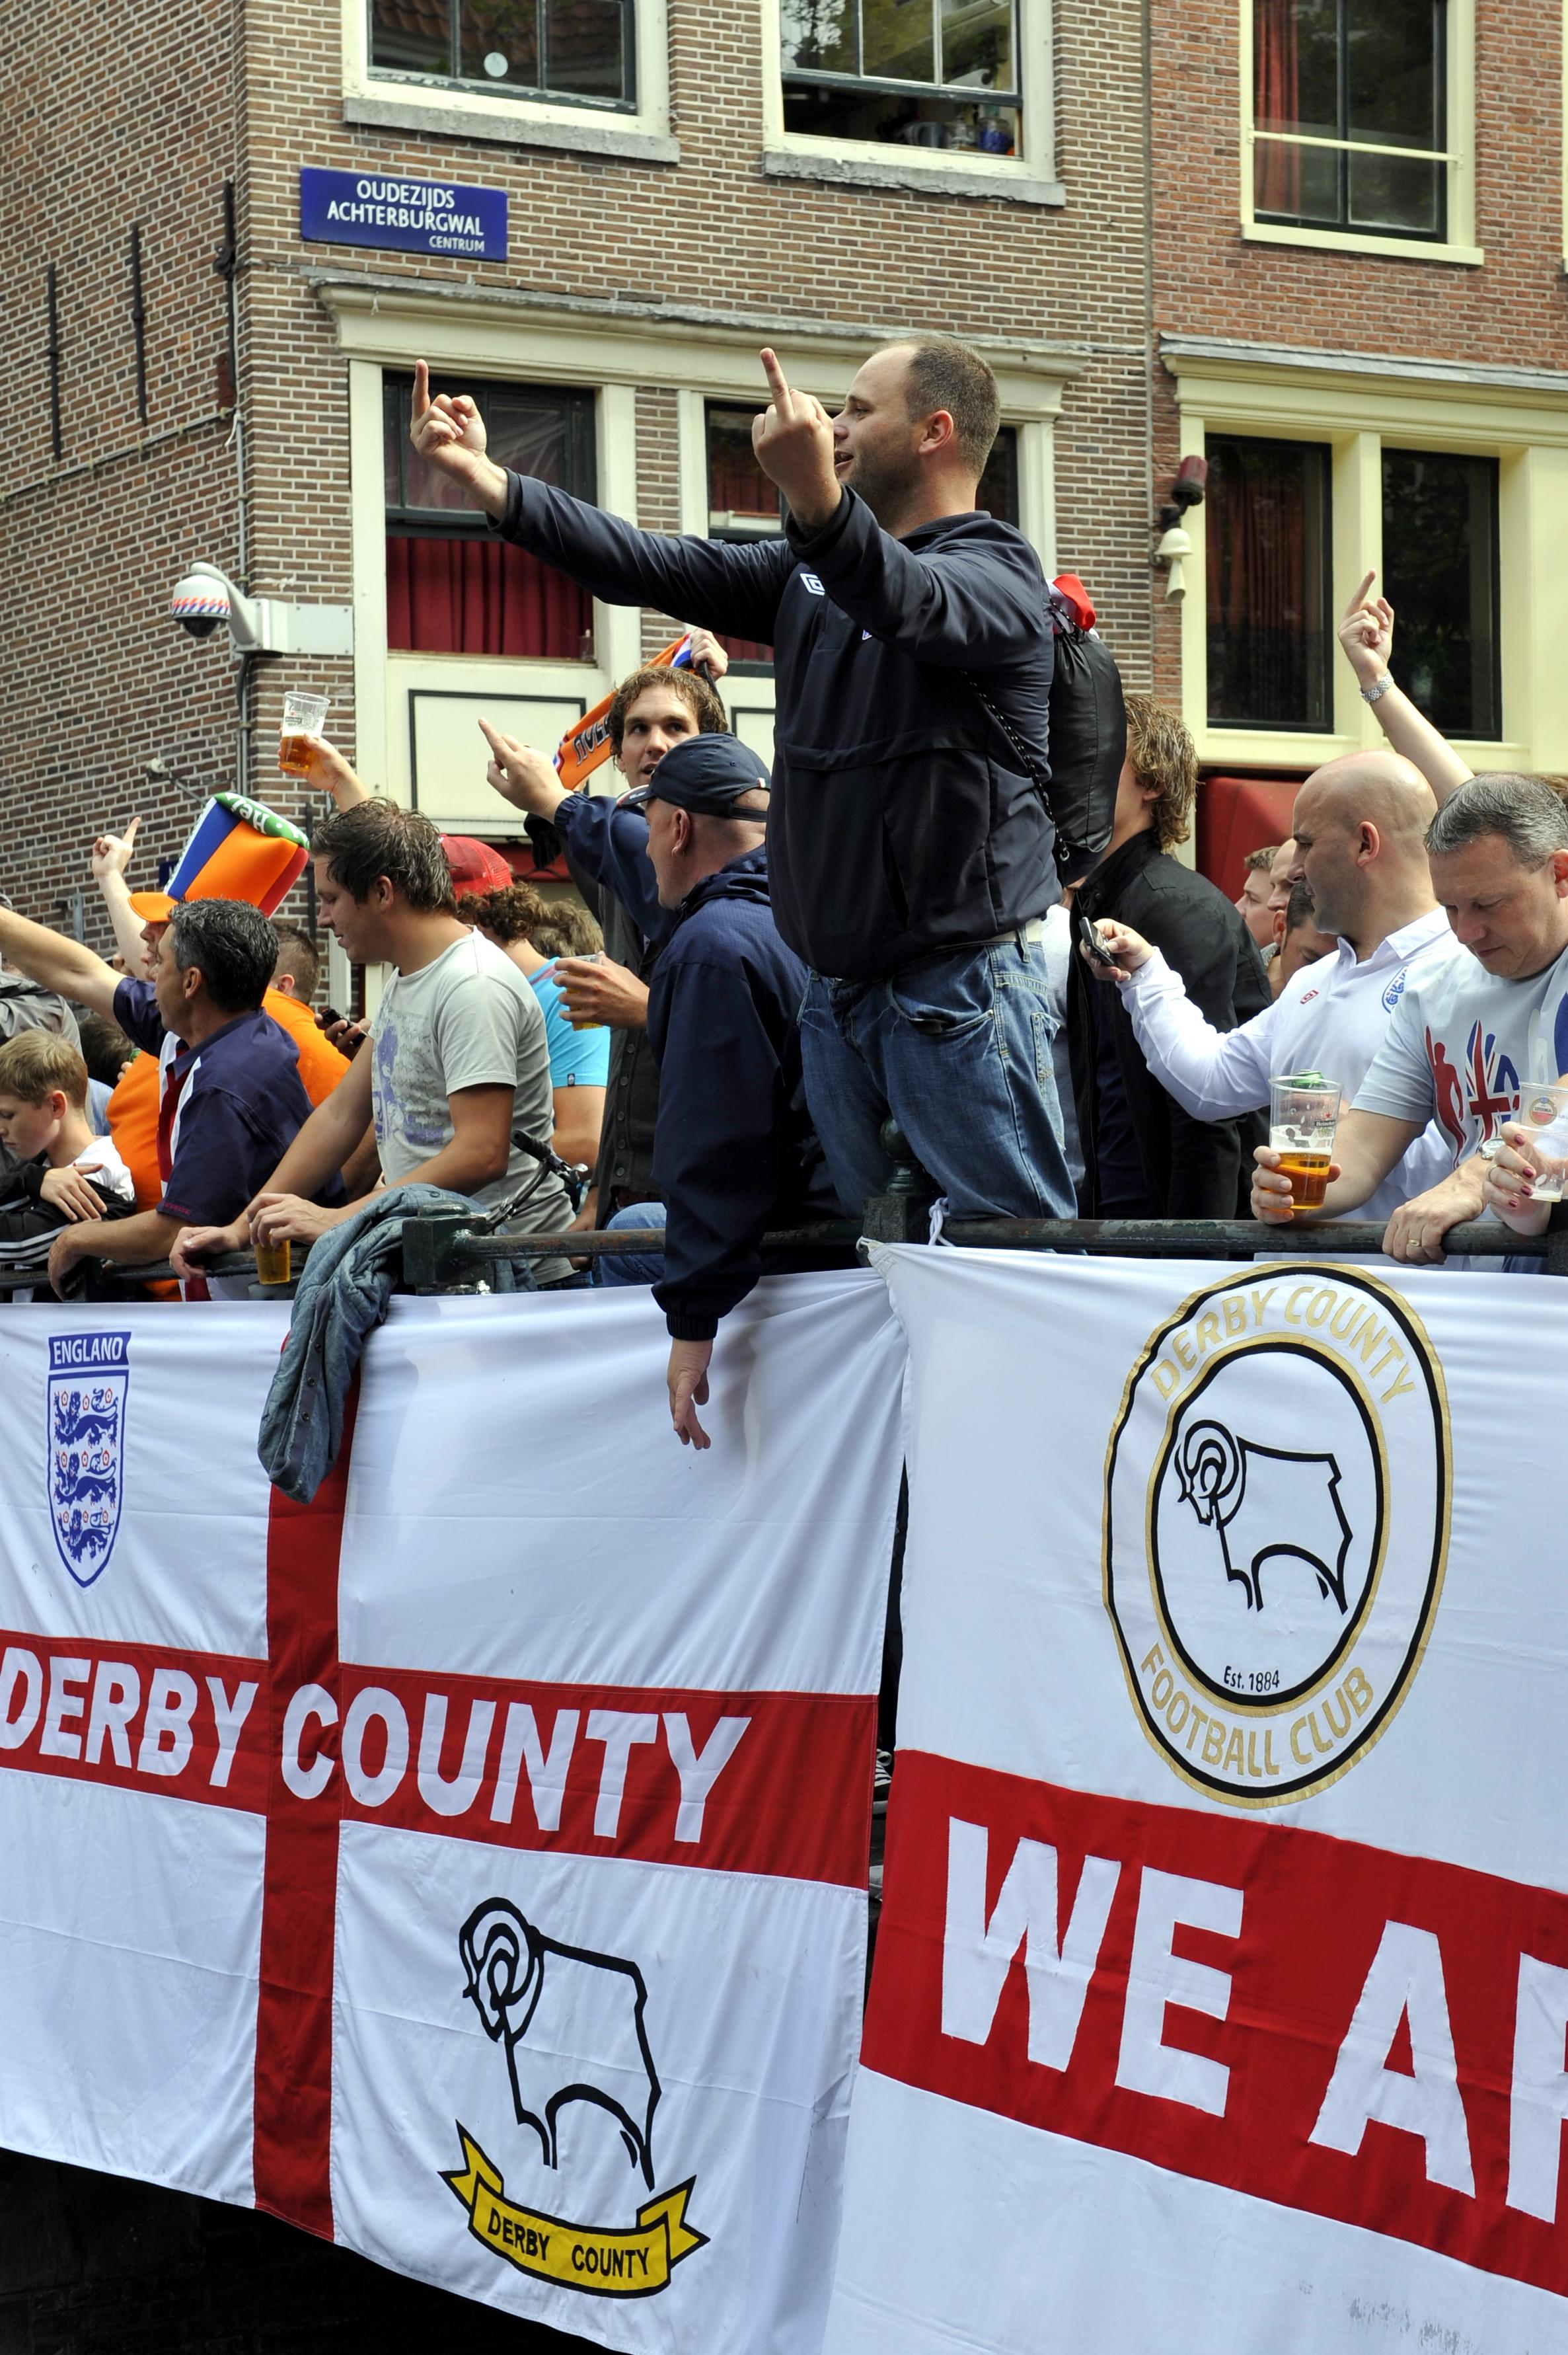 File:Flickr - NewsPhoto! - football, Netherlands - England (5).jpg - Wikimedia Commons